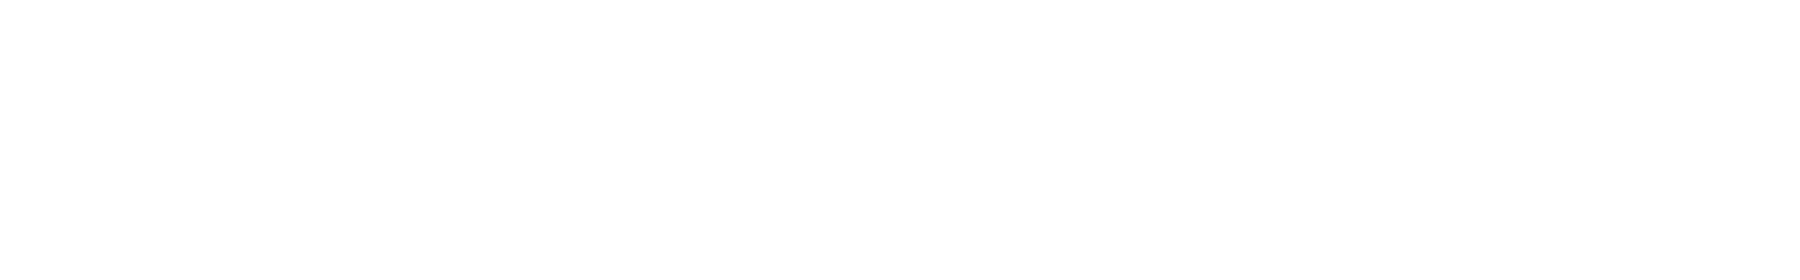 blbc dustygretsch 95 e